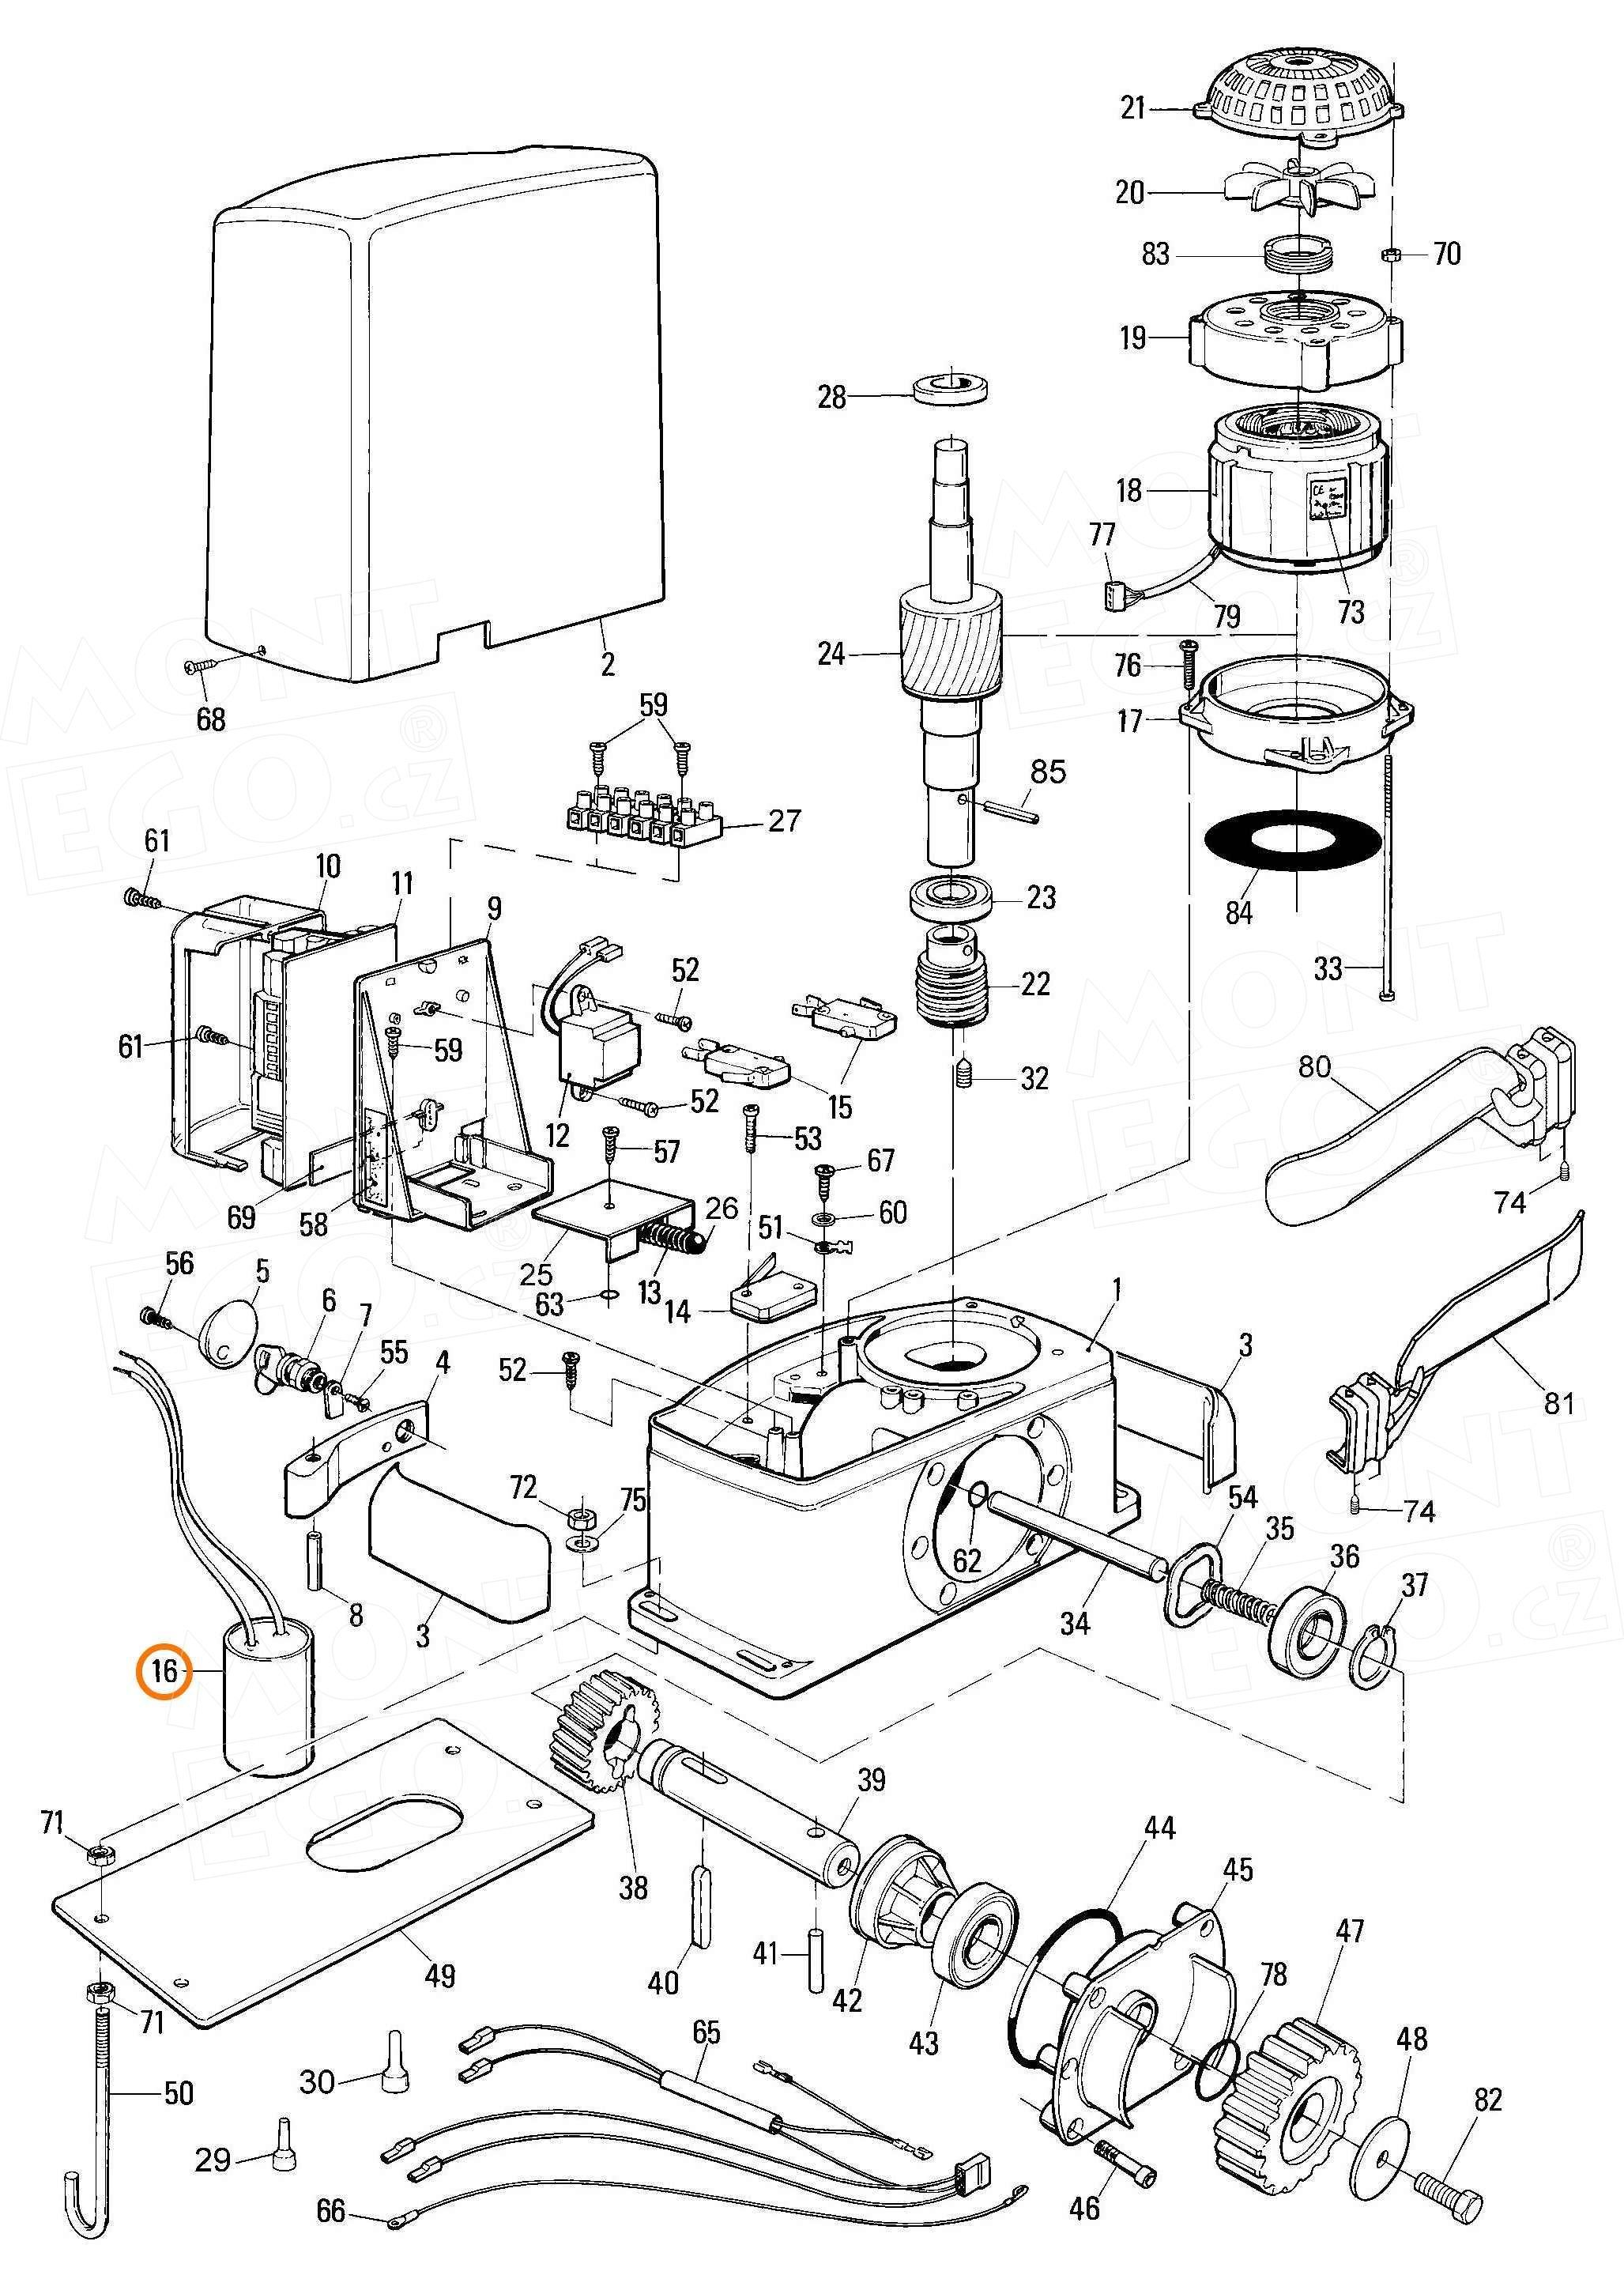 30U450A.0727 je kondenzátor 30uF pro pohony Nice Thor TH1551 i TH2251